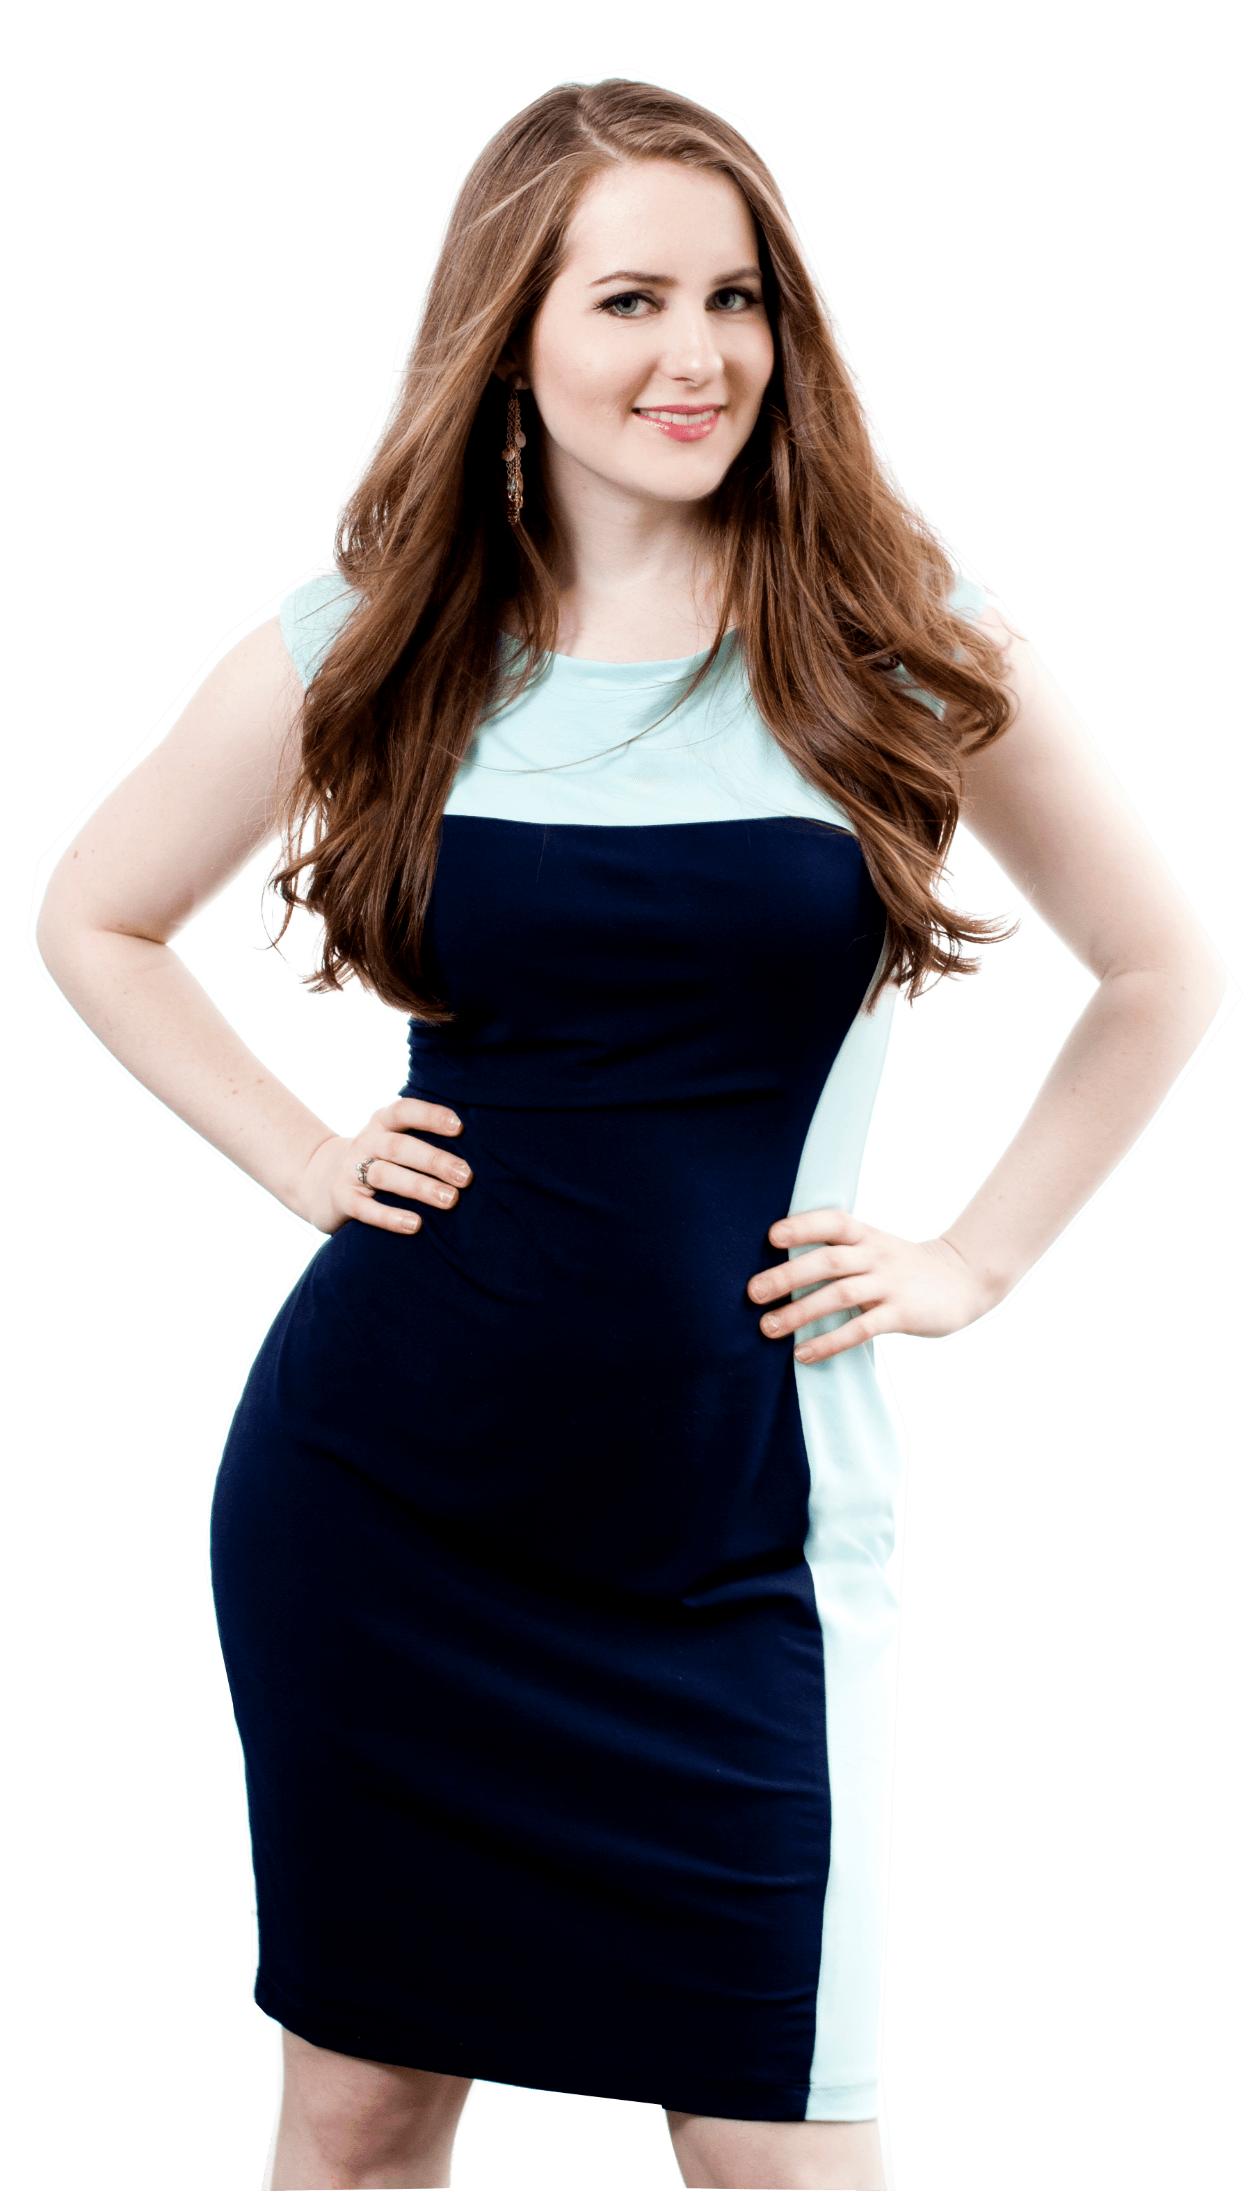 Gillian Perkins Author and Entrepreneur